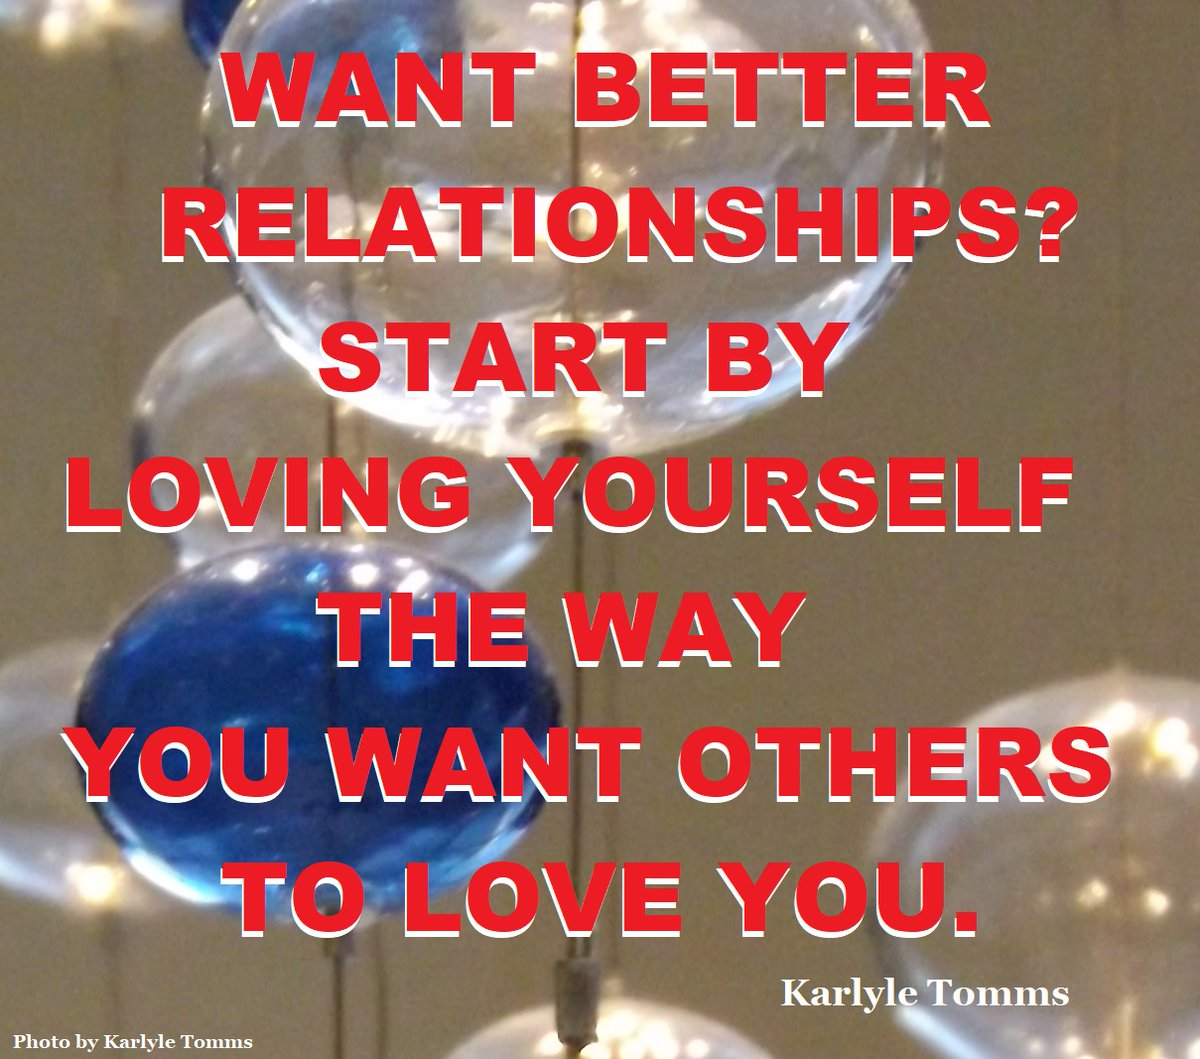 https://t.co/new4yBX19U #relationships #loveyourself https://t.co/LLUNjsQLpd